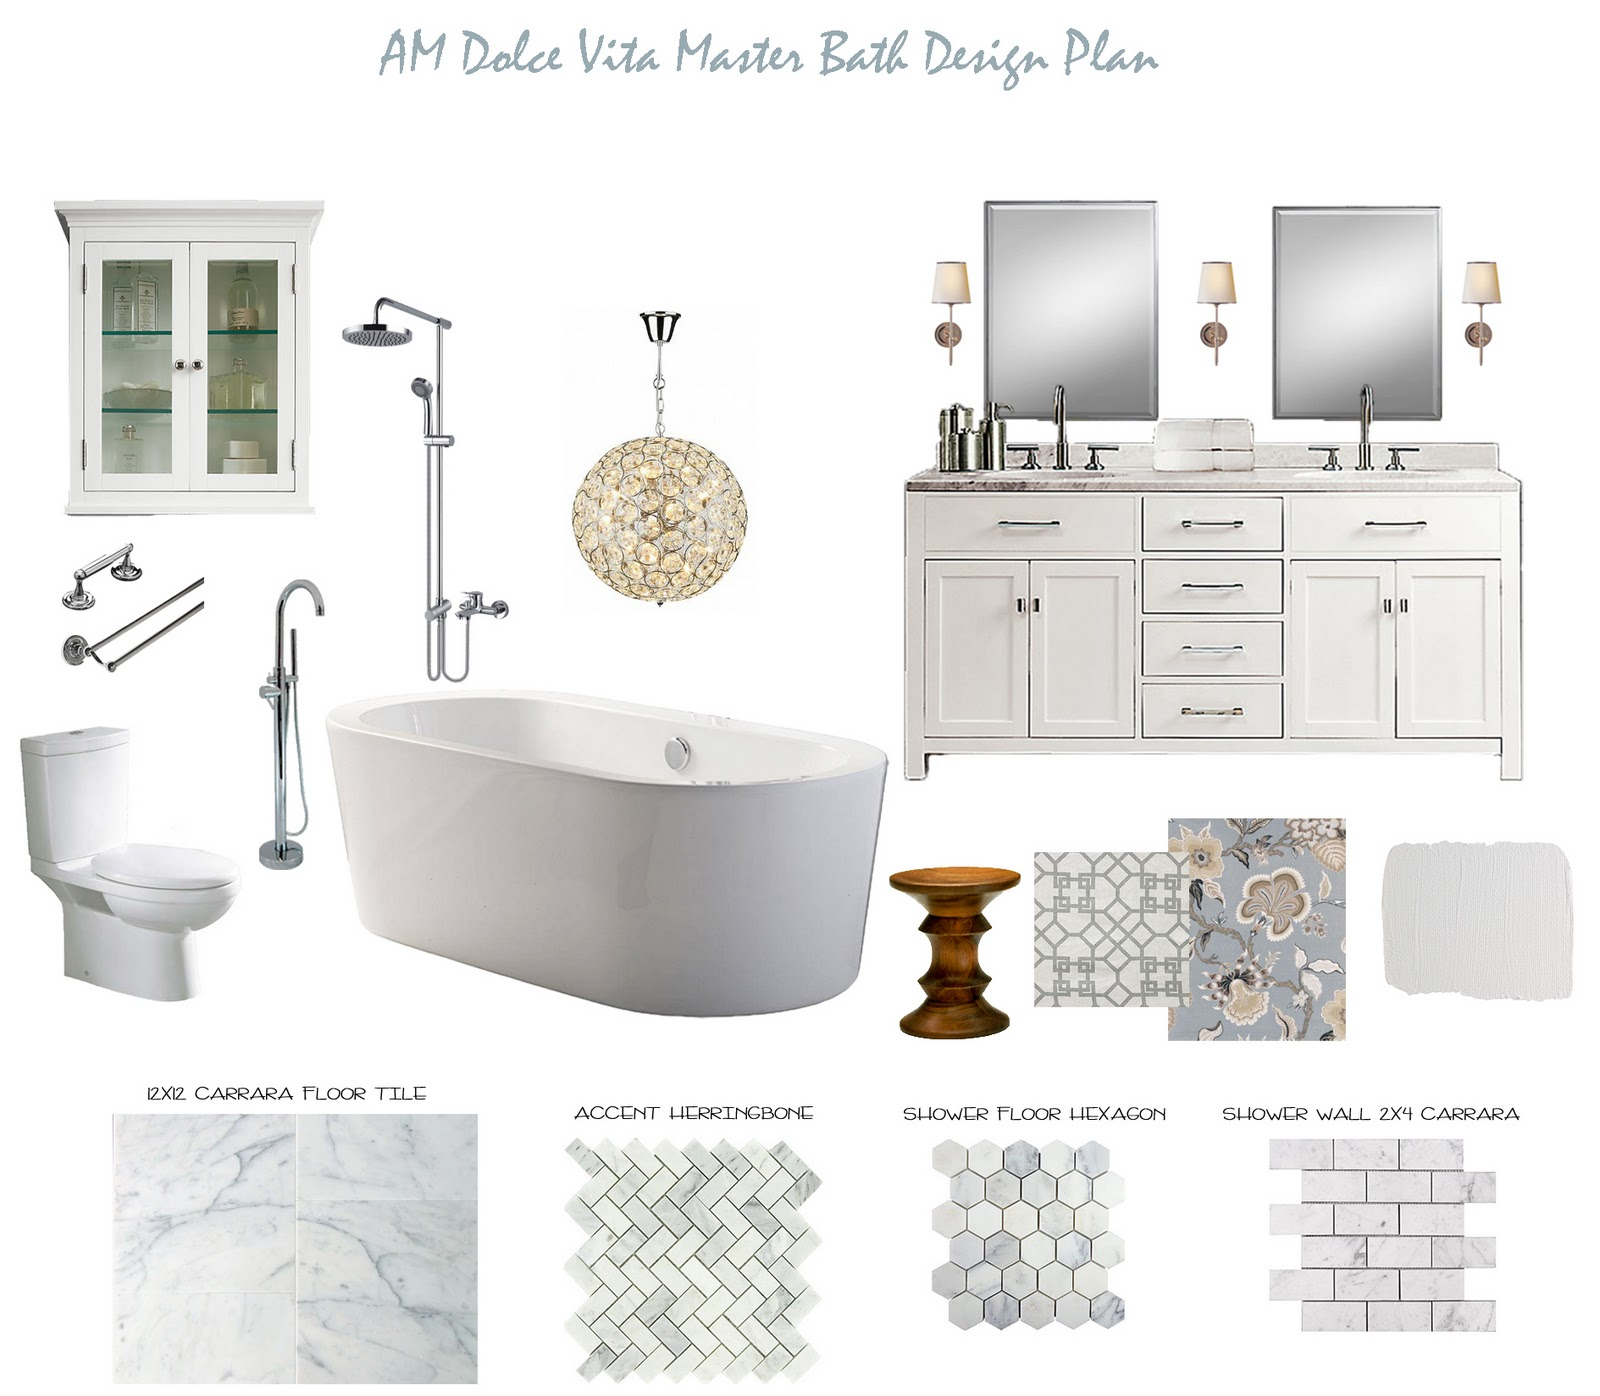 Am Dolce Vita Master Bath Design Plan